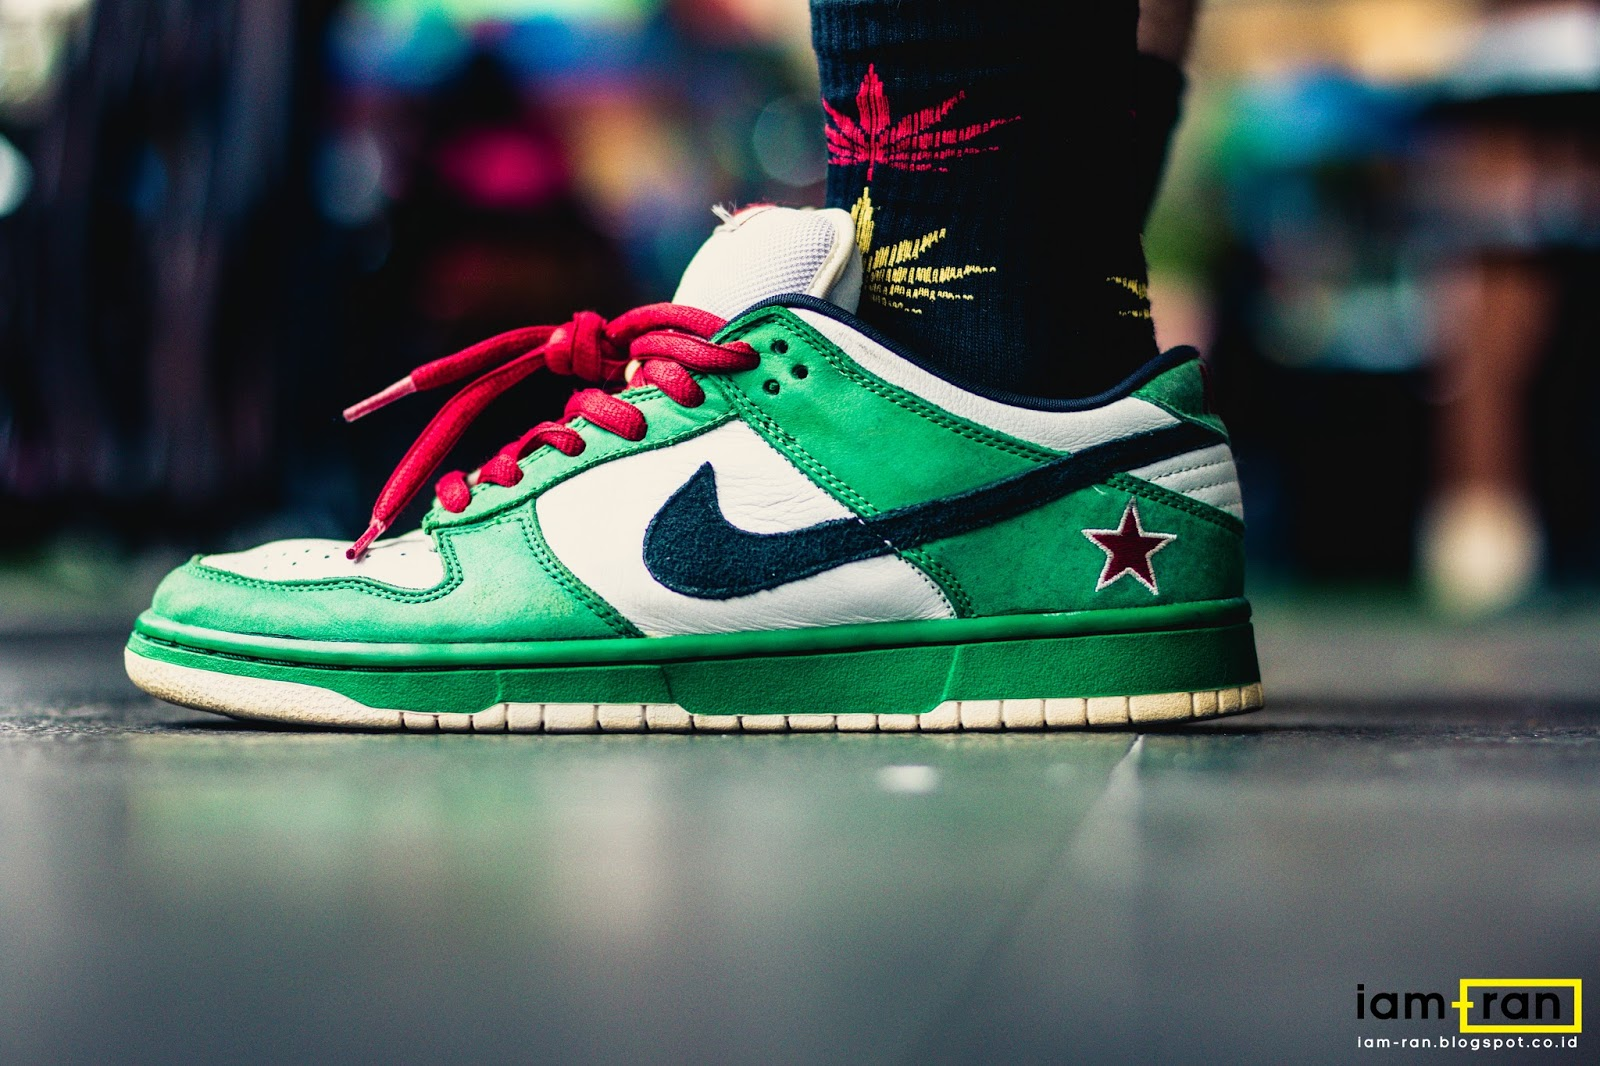 official photos 44b5b 0a558 IAM-RAN: ON FEET : Tirta - Nike SB Dunk Low Heineken